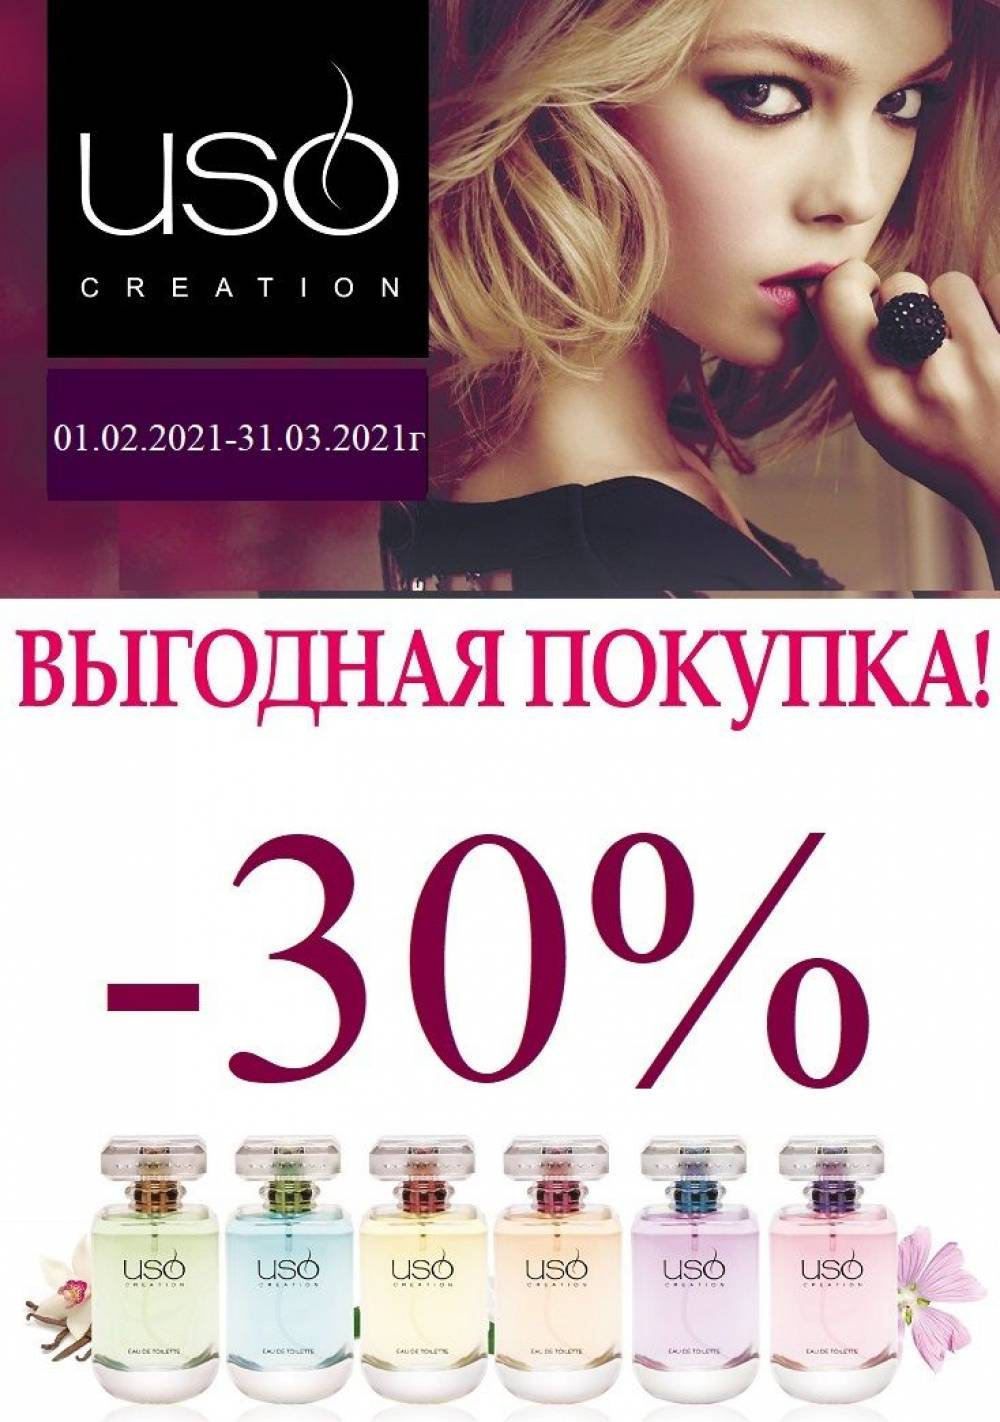 Акции ФЕВРАЛЯ -30% на косметику